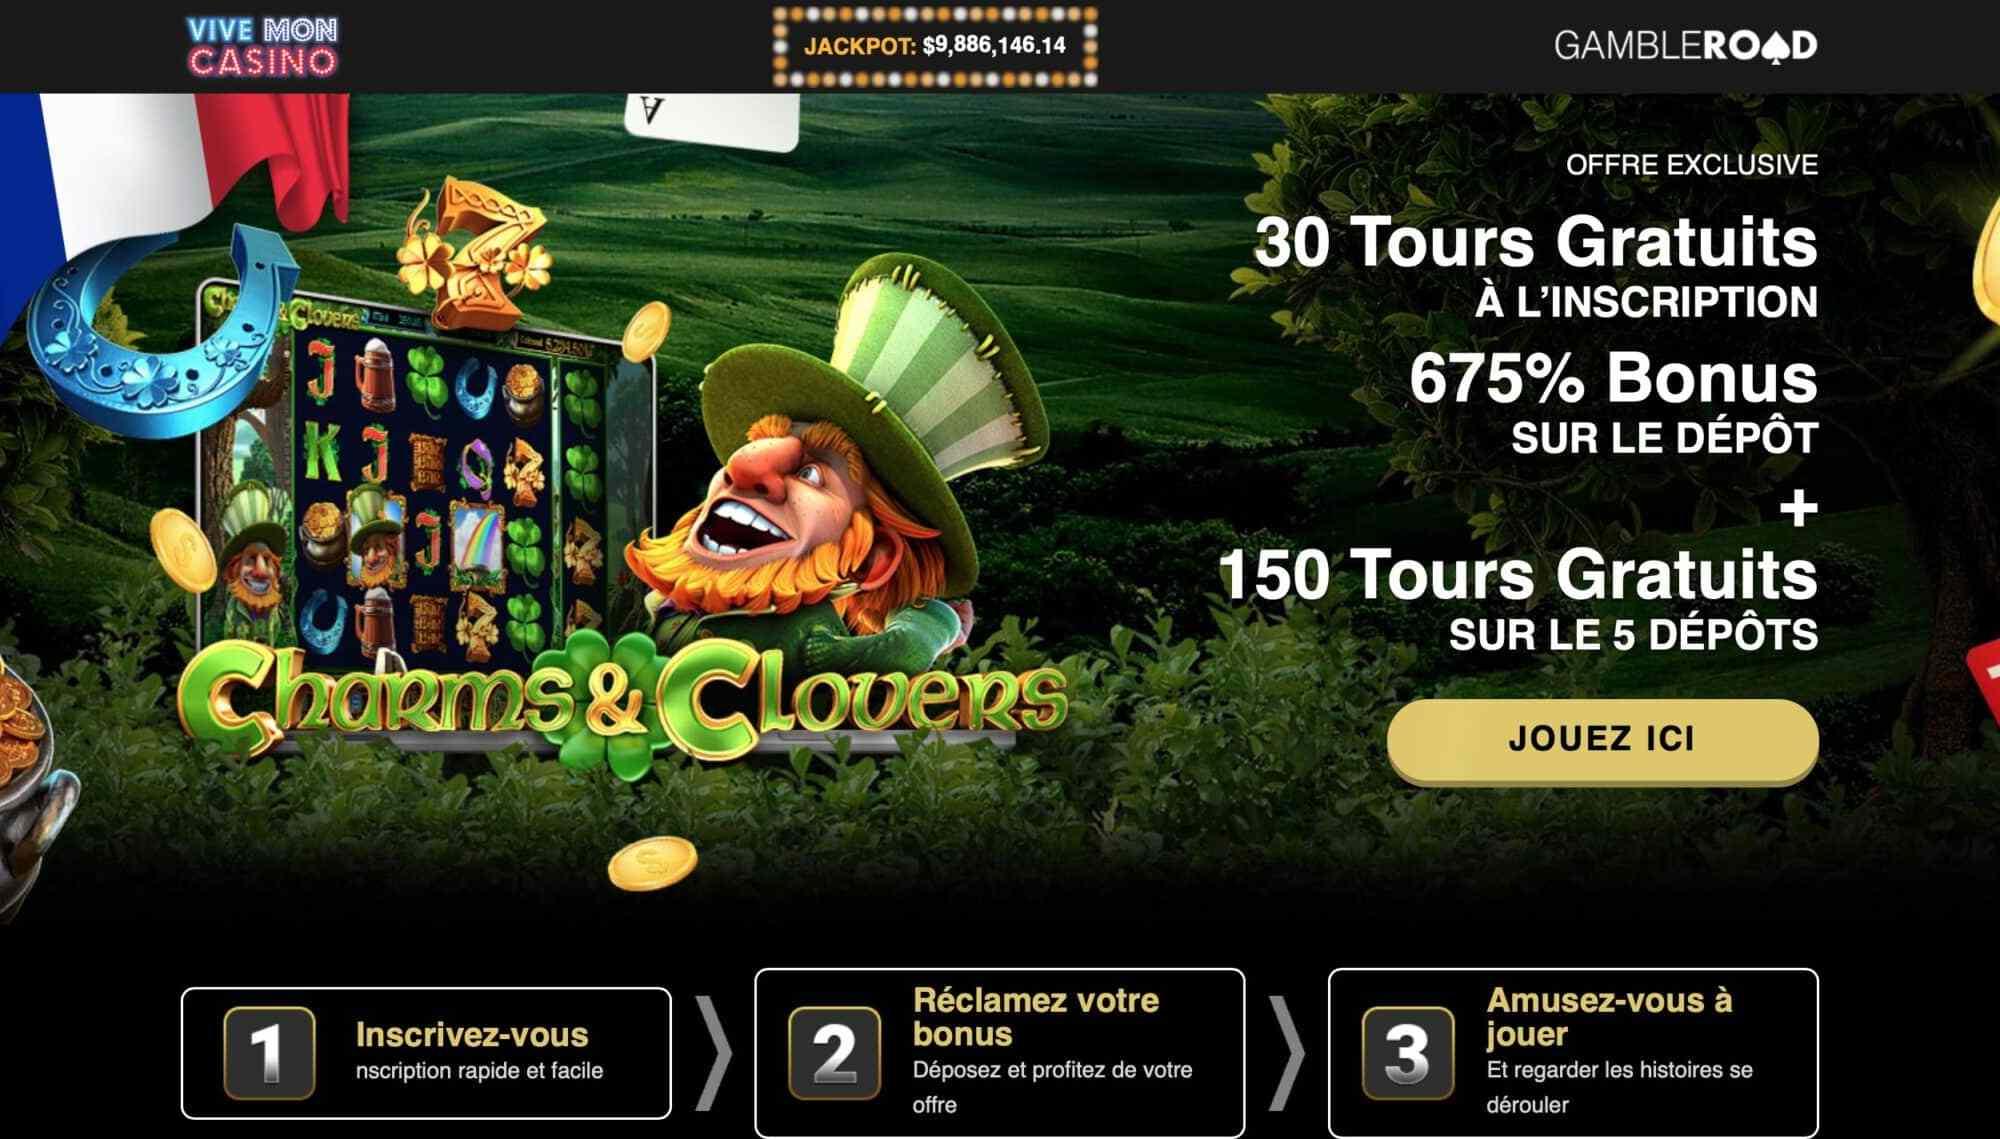 Vive Mon Casino - Get 30 Free Spins + 675% Deposit Bonus